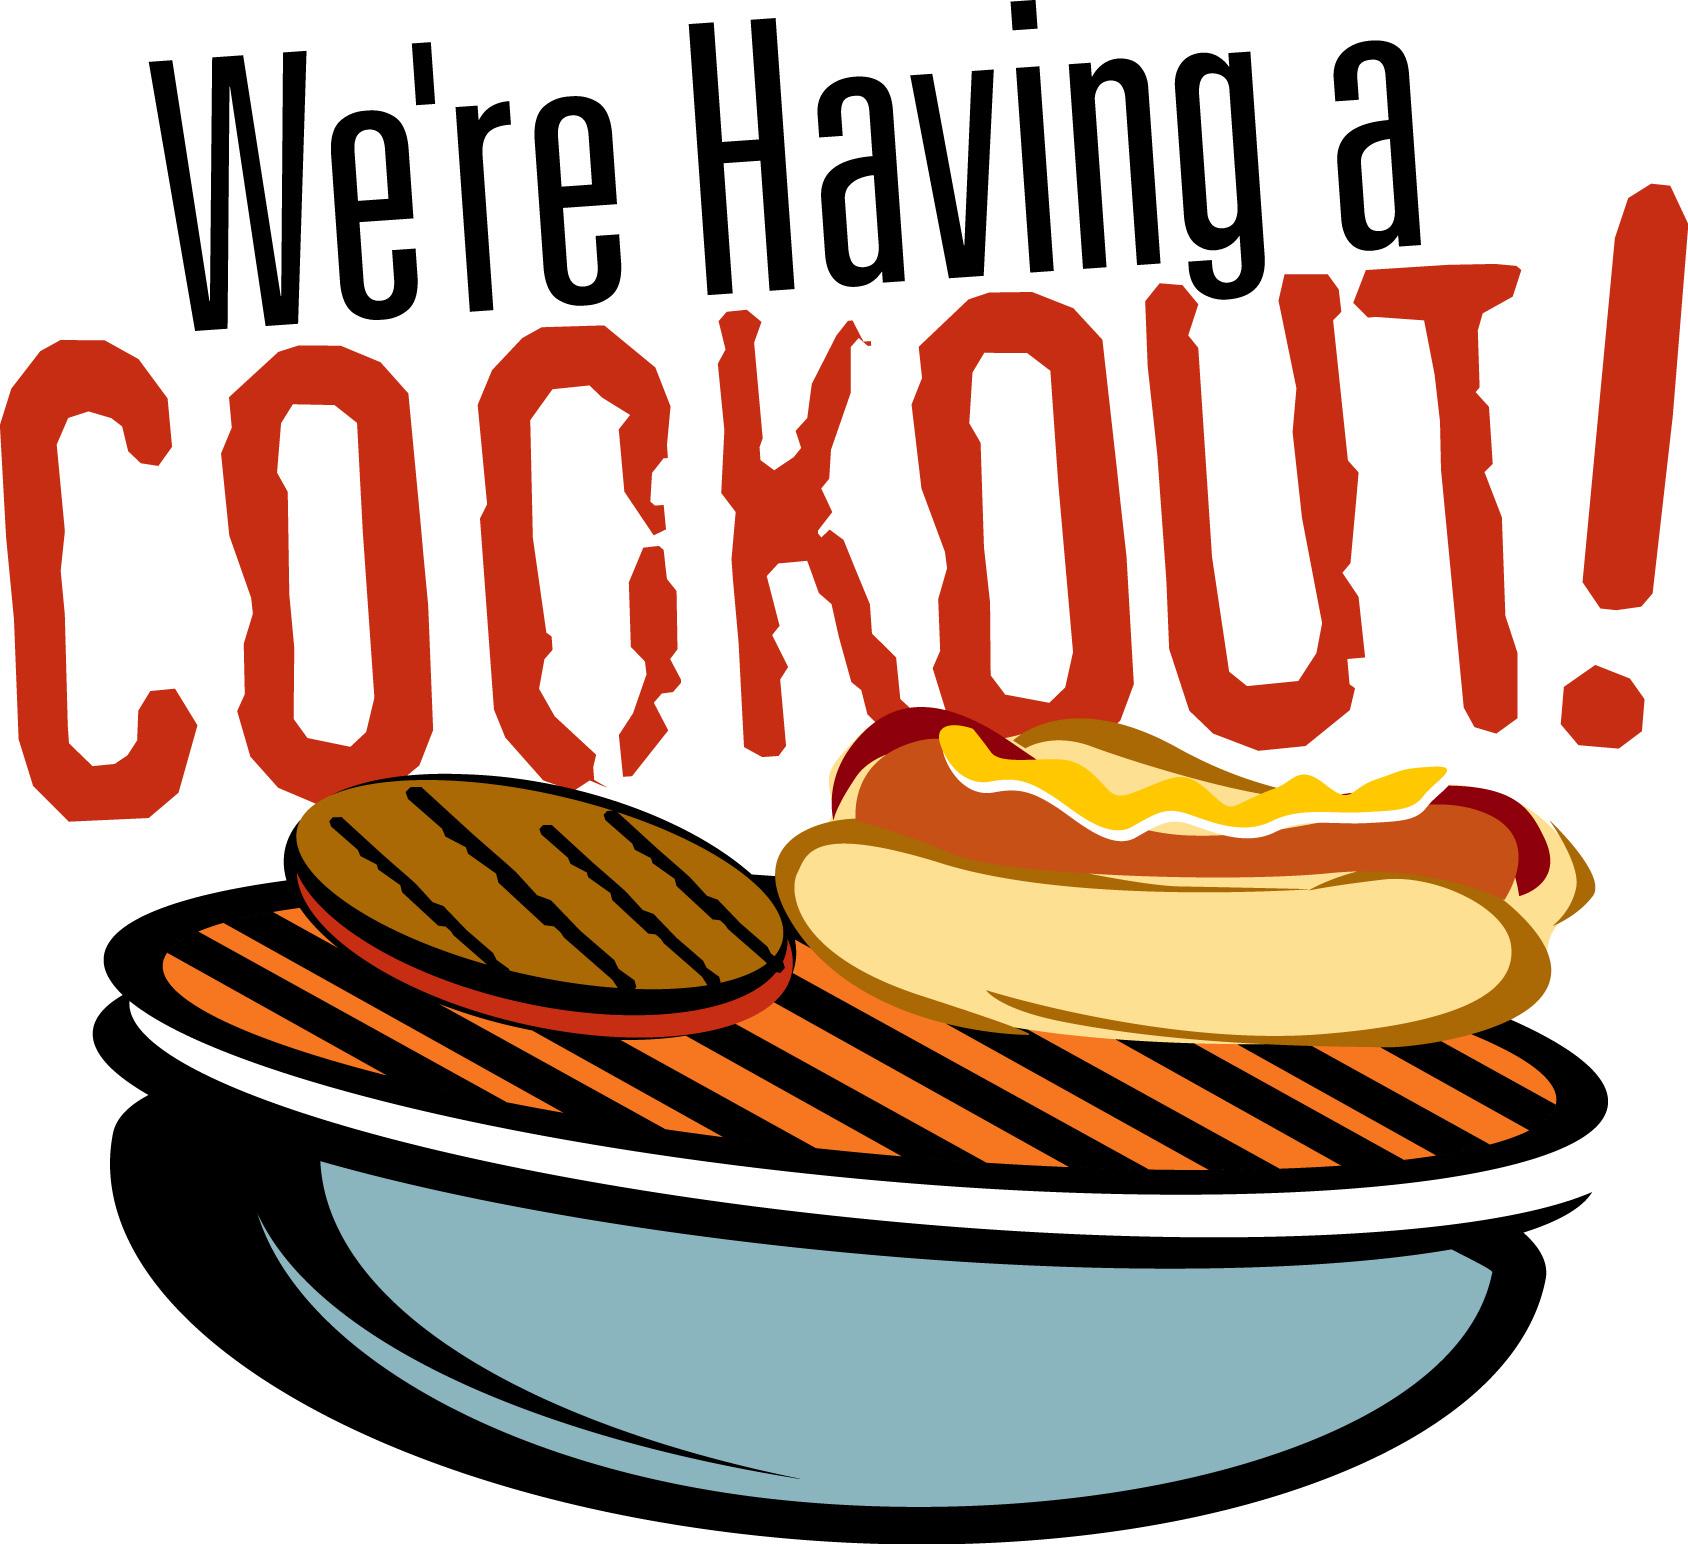 CookOut.jpg